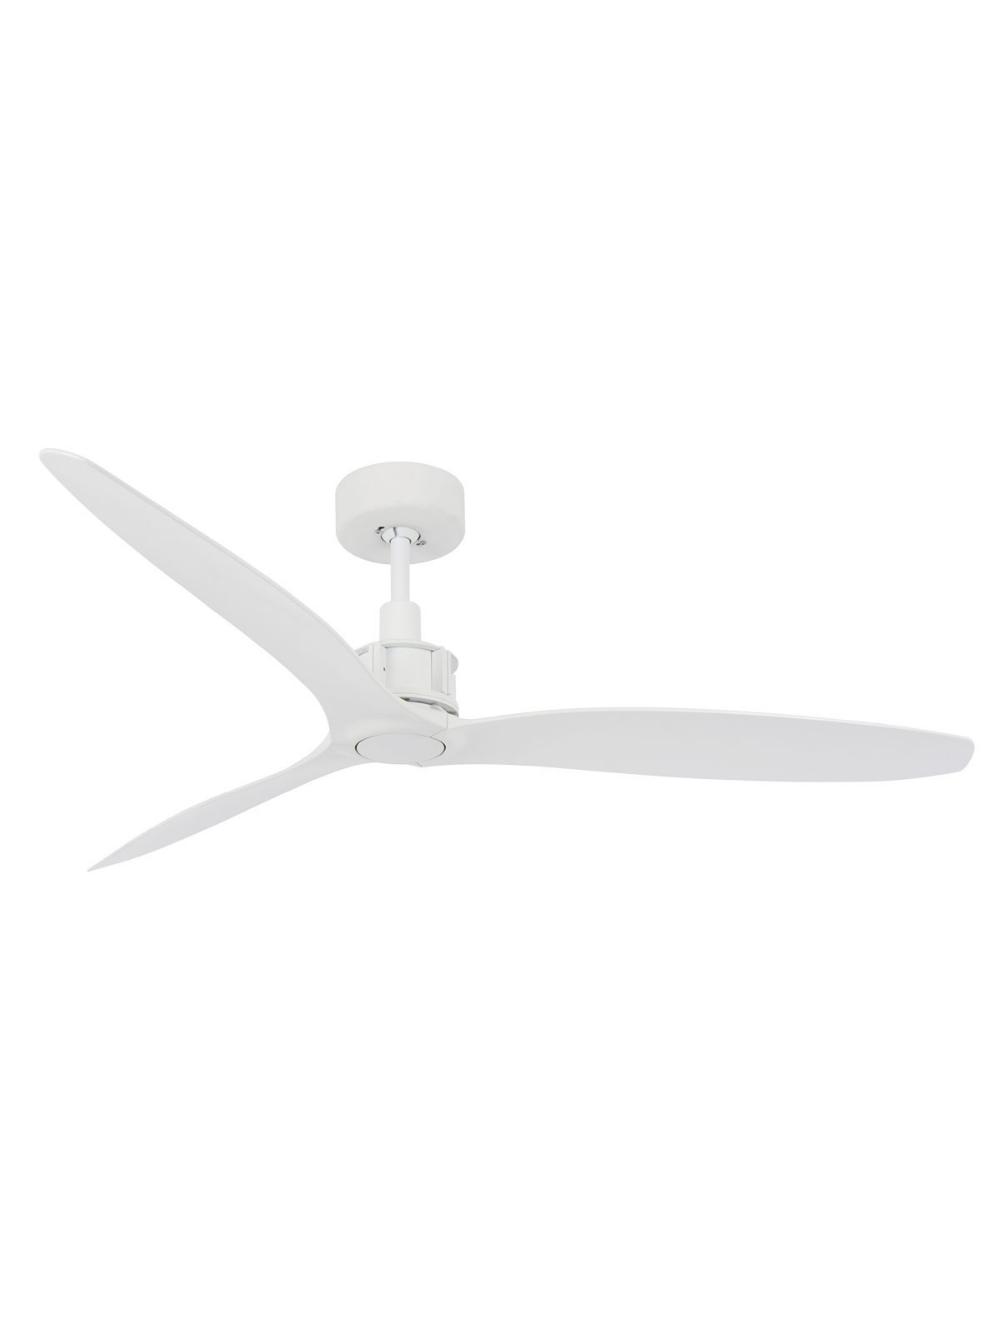 Minka Aire Hilo Ceiling Fan White Manual Guide